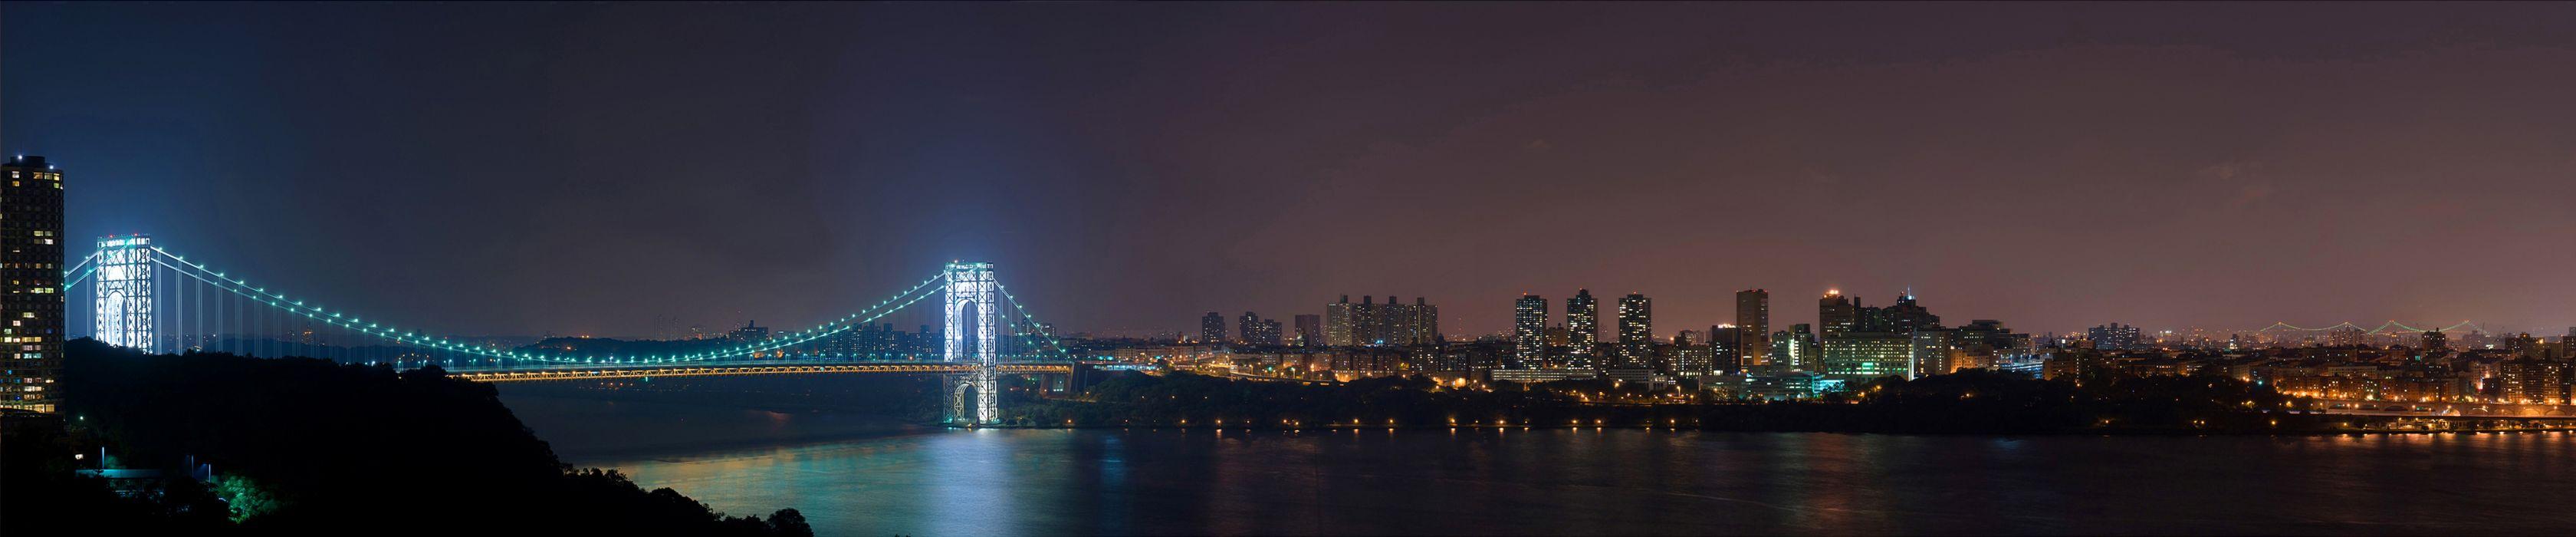 New York George Washington Bridge   g wallpaper